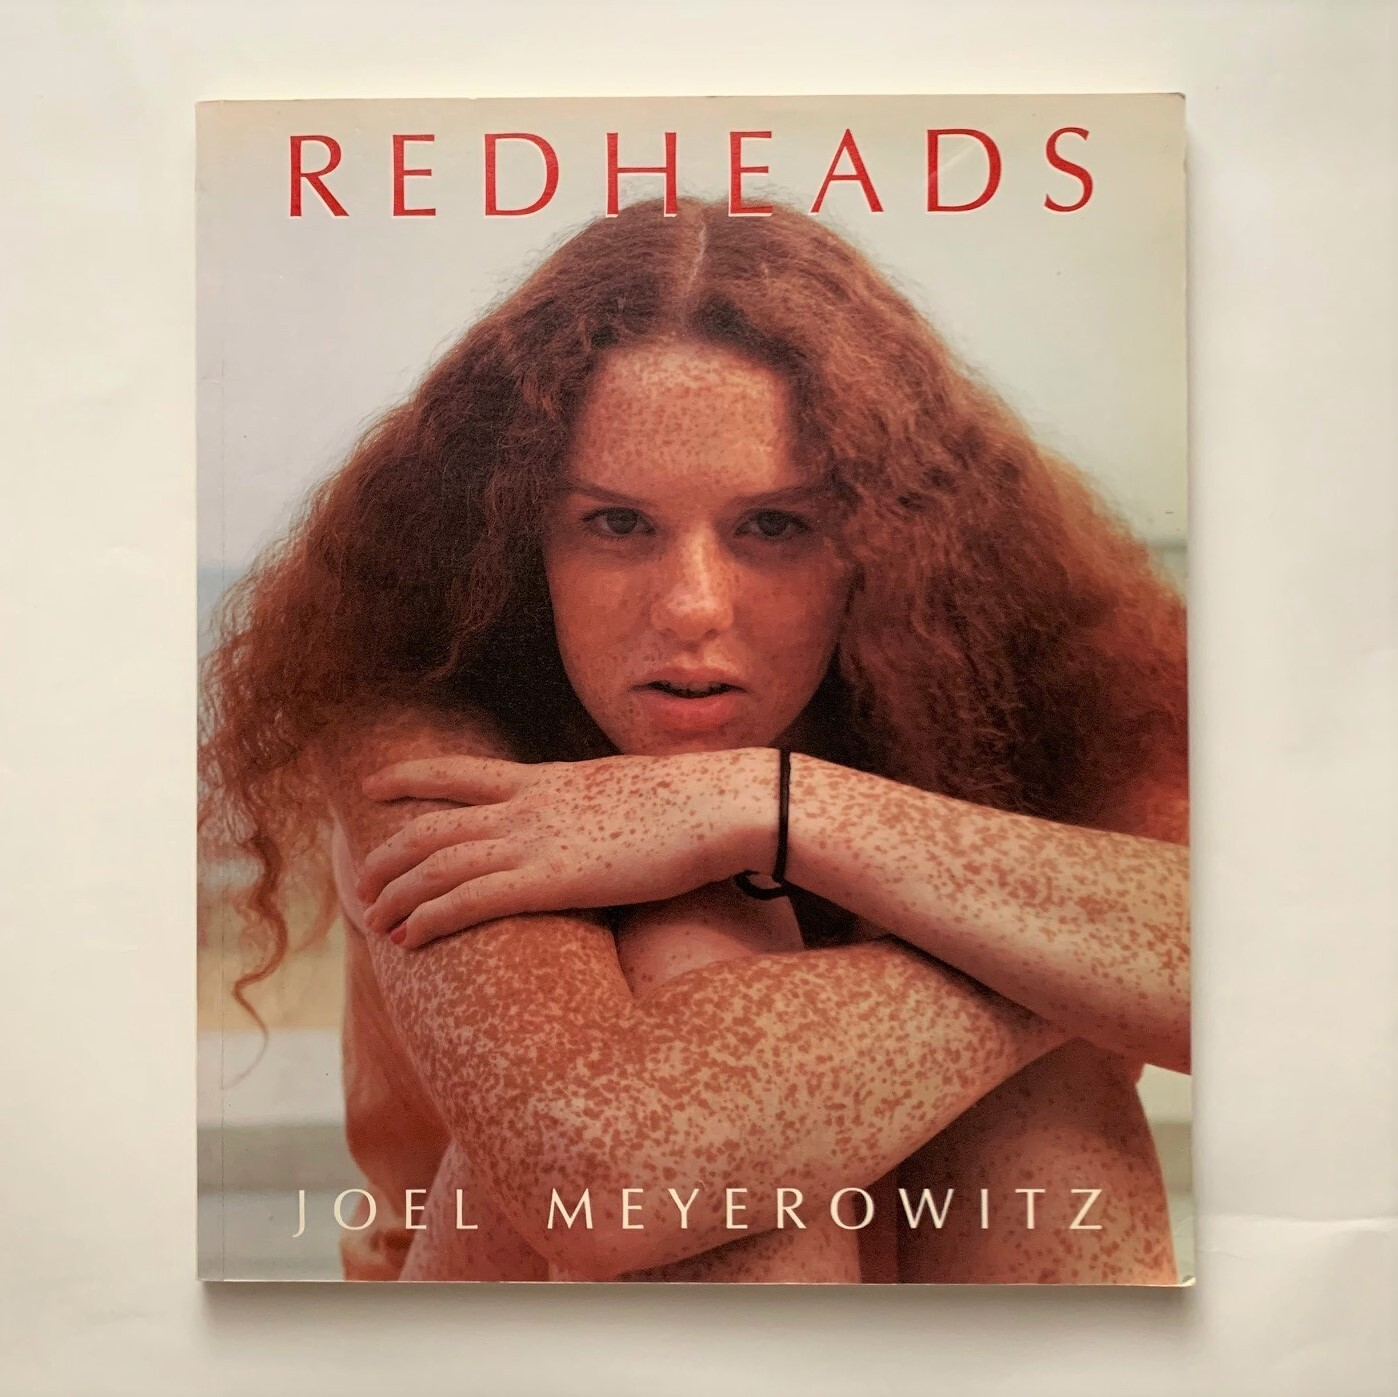 Redheads / Joel Meyerowitz ジョエル・マイヤーヴィッツ